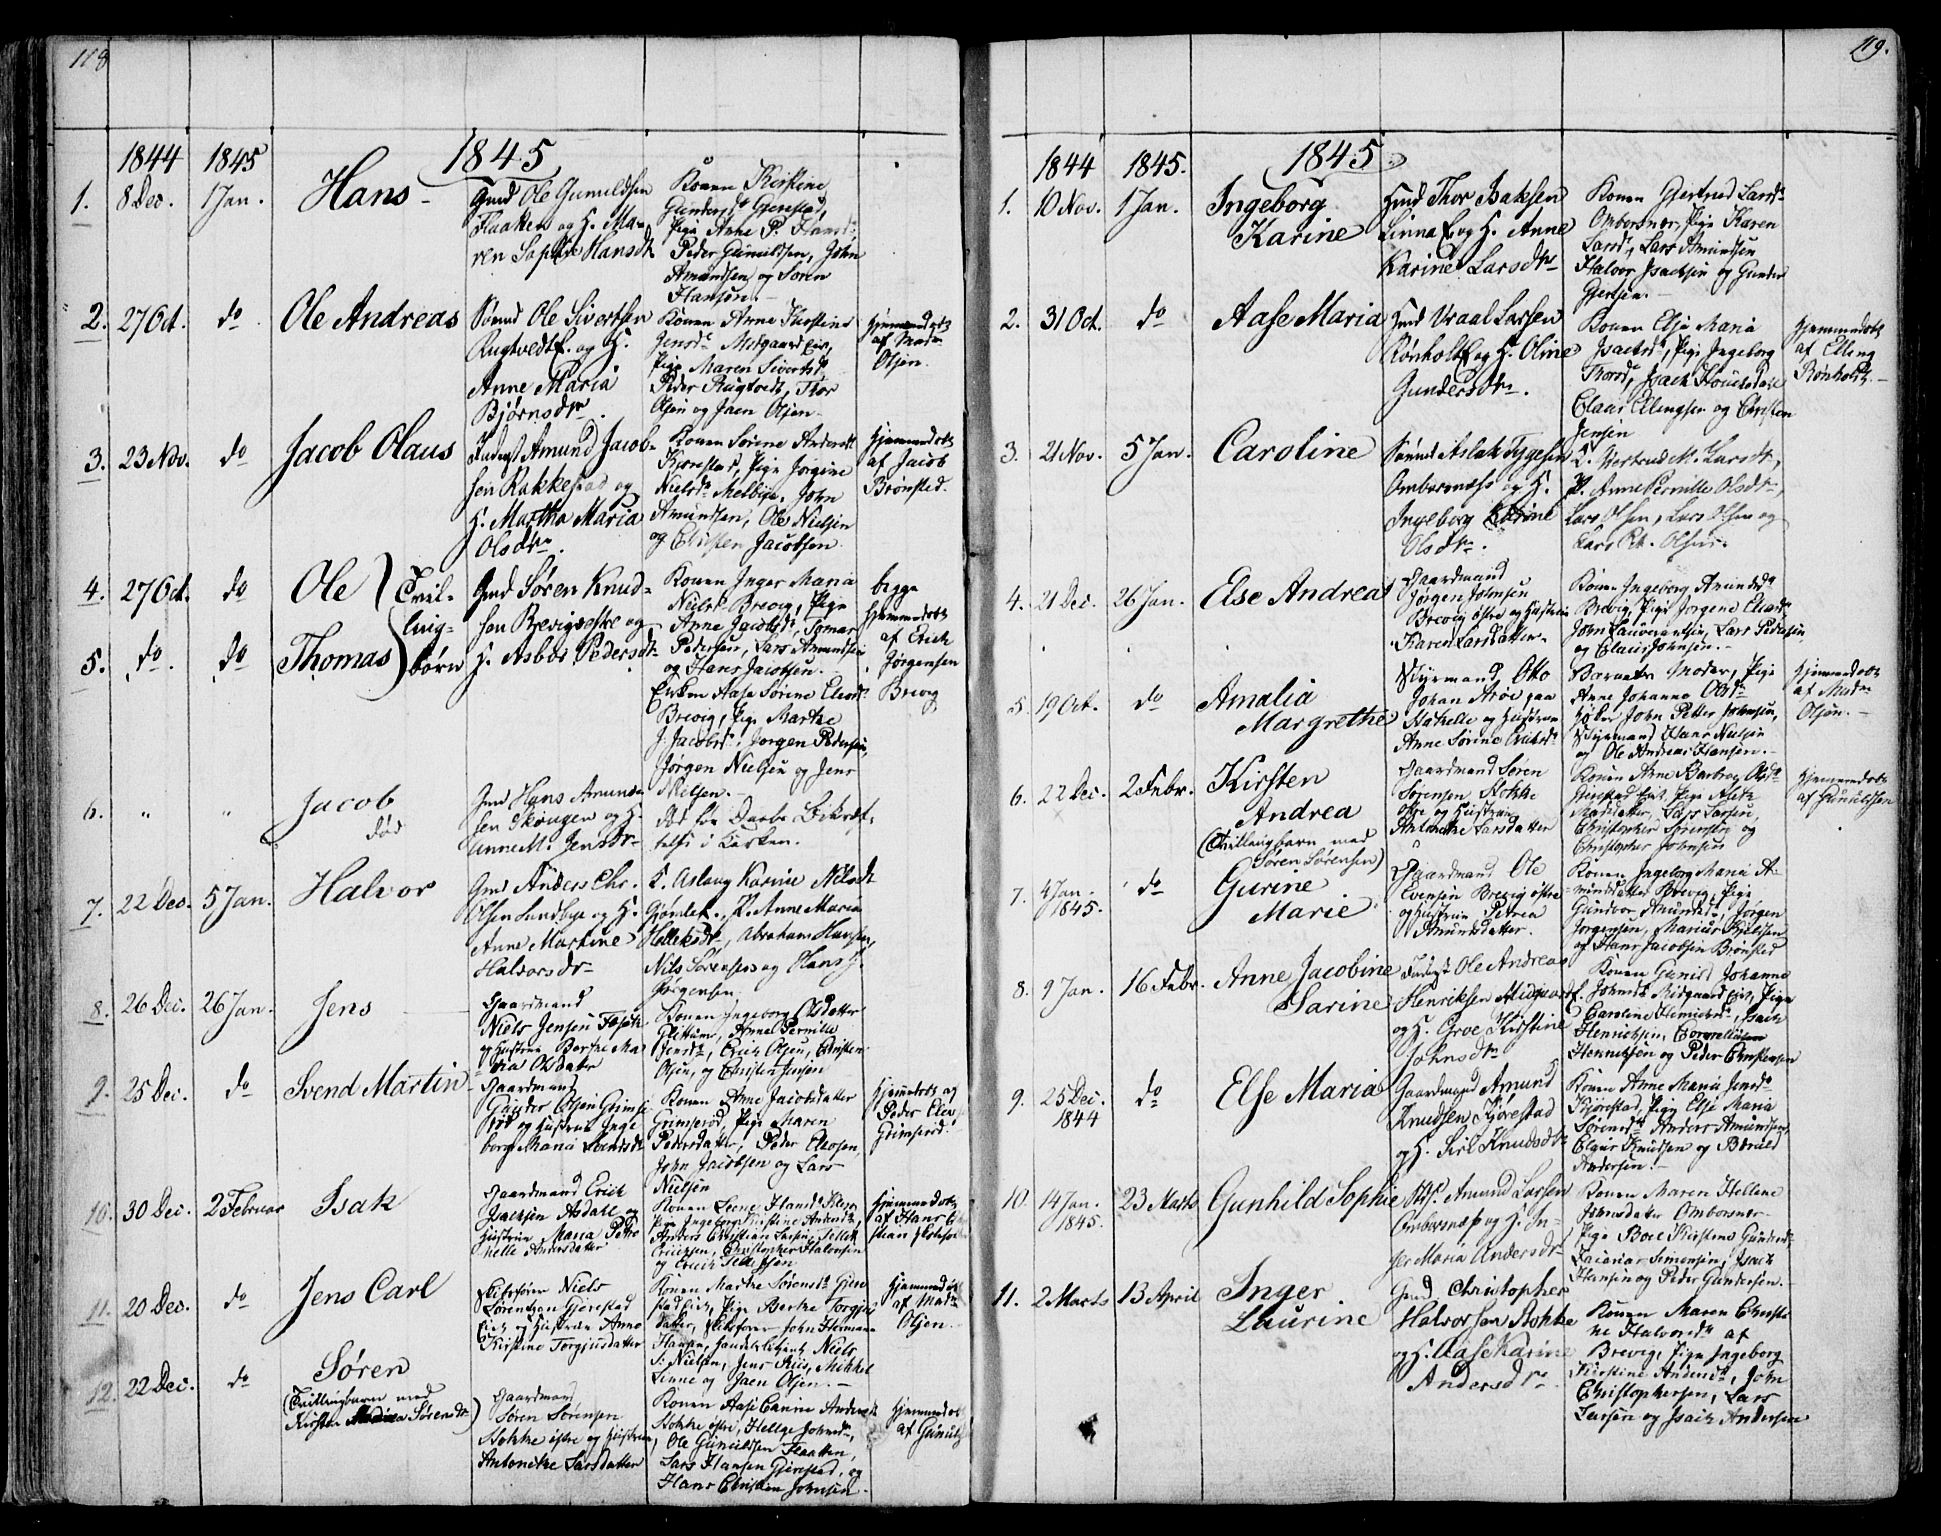 SAKO, Bamble kirkebøker, F/Fa/L0004: Ministerialbok nr. I 4, 1834-1853, s. 118-119